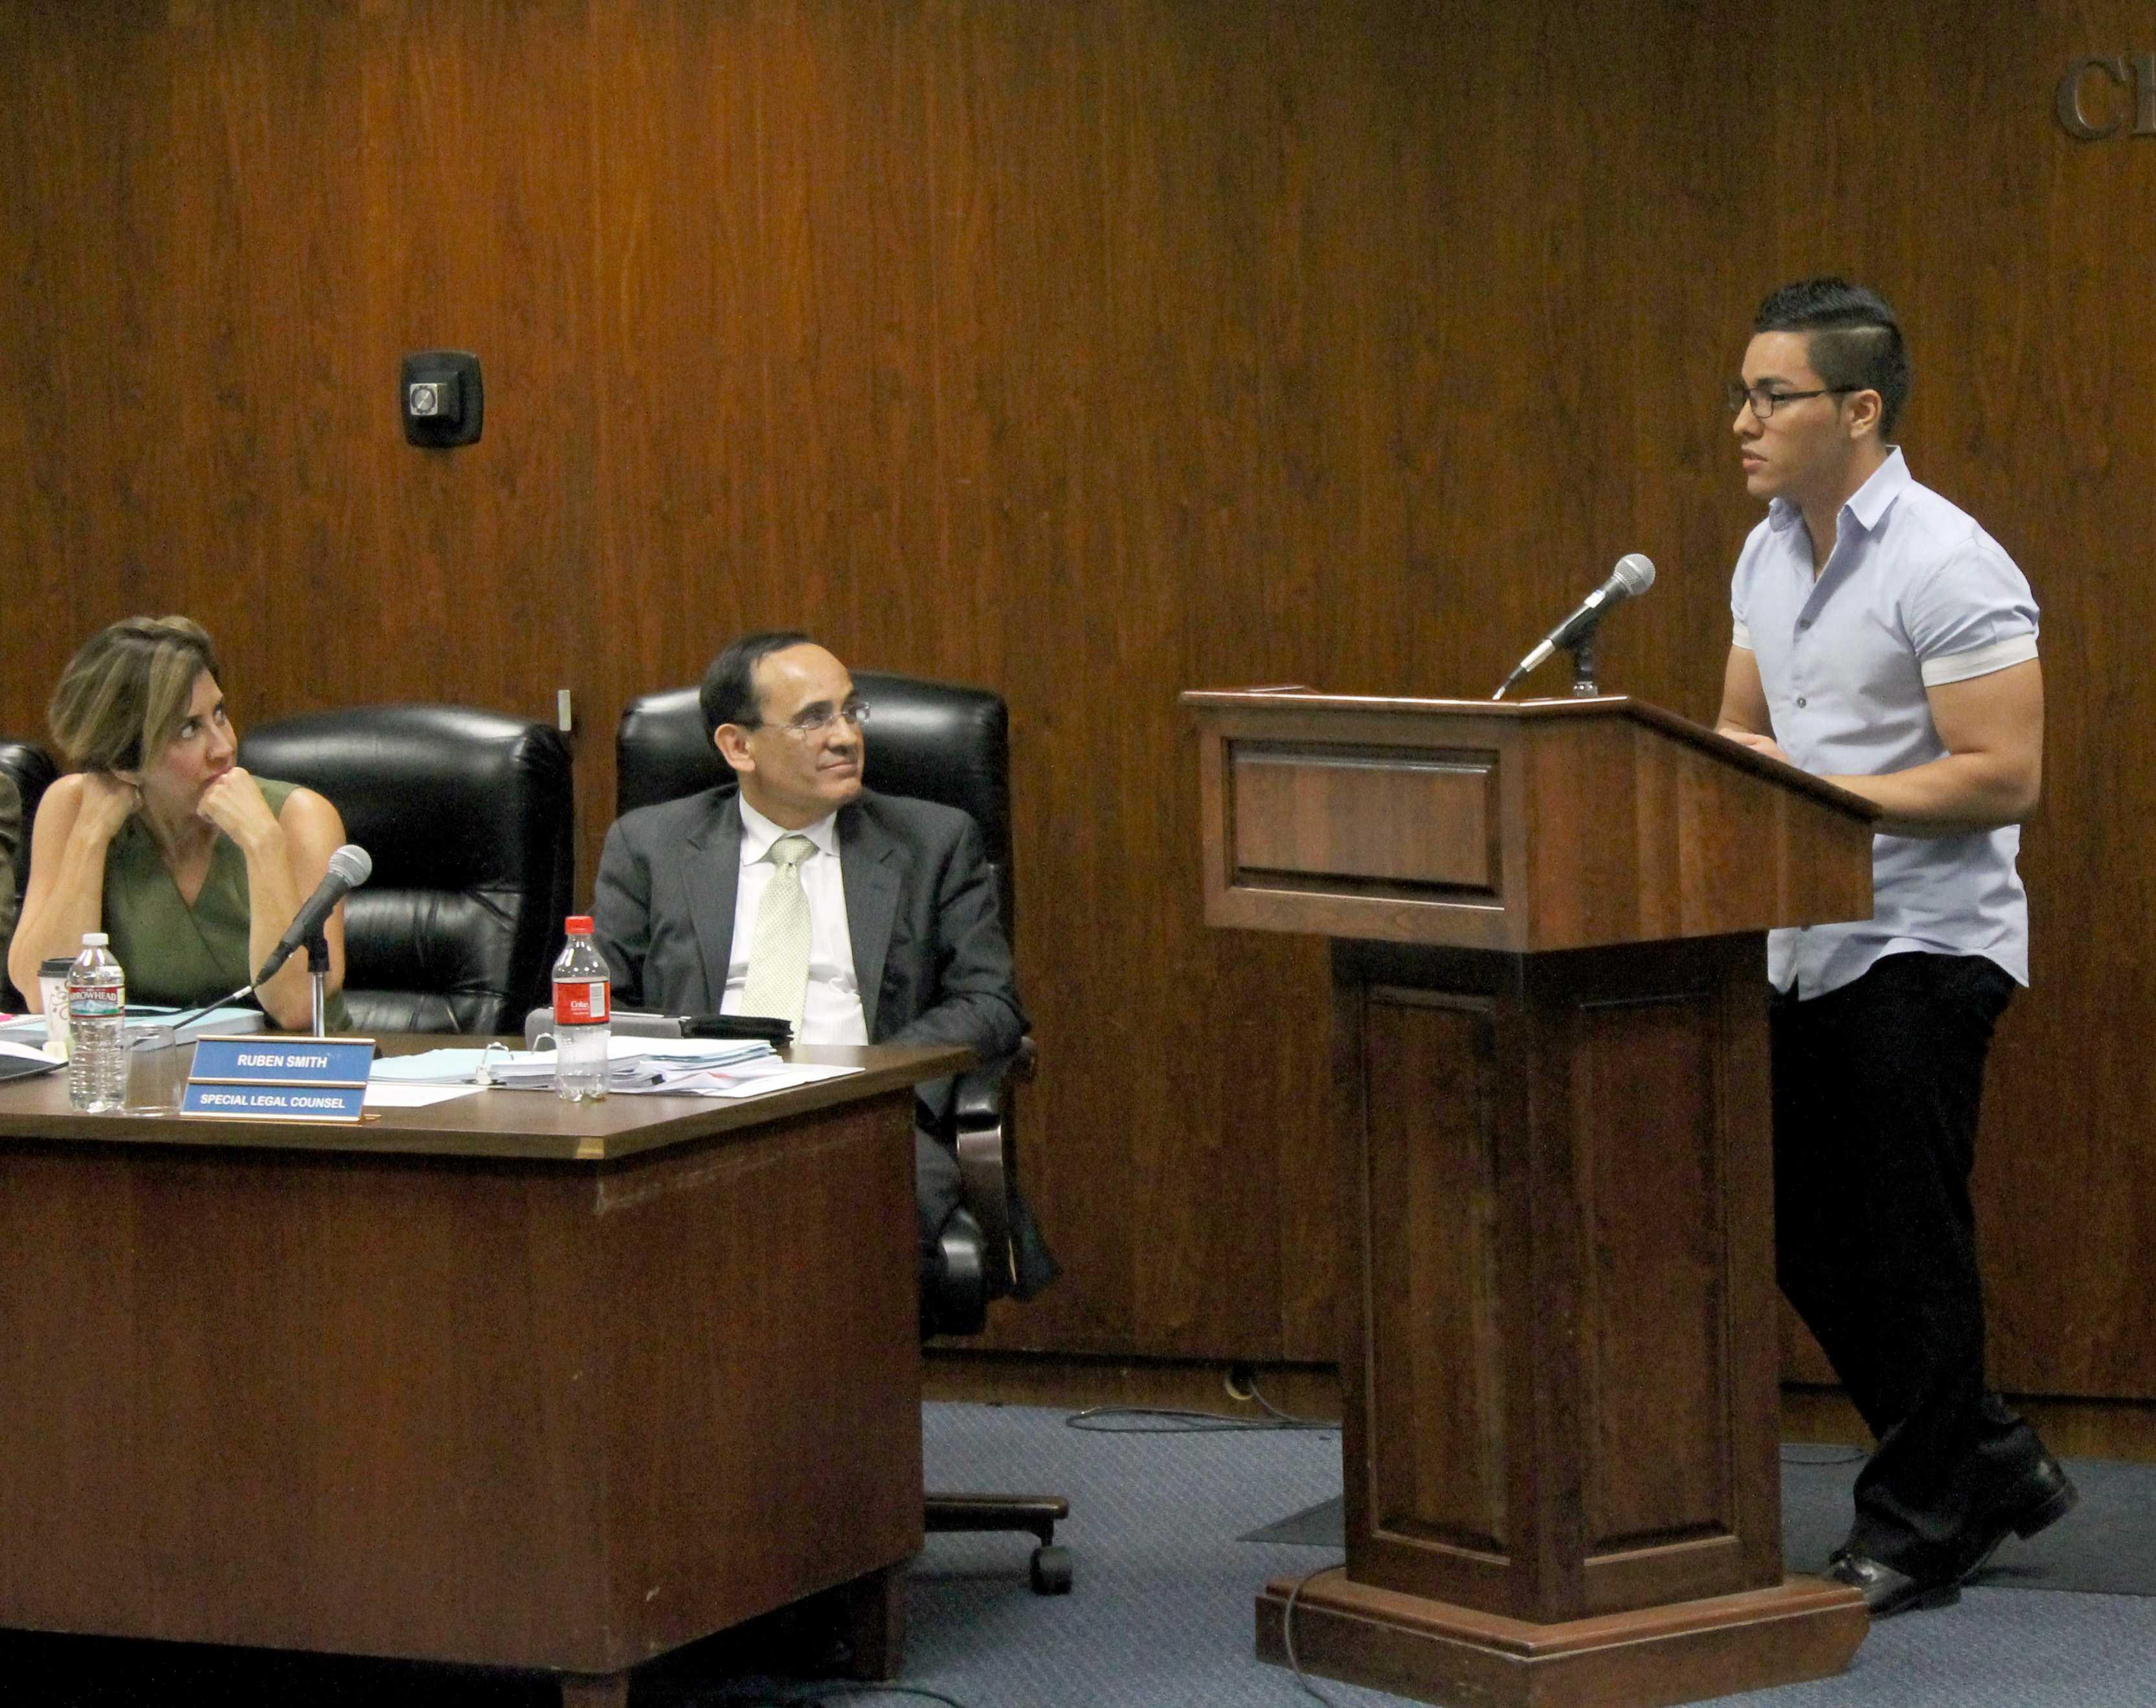 ASCC President Juan Ramirez presents methods of getting new vendors on campus to the board of trustees. Photo credit: Gustavo Olguin